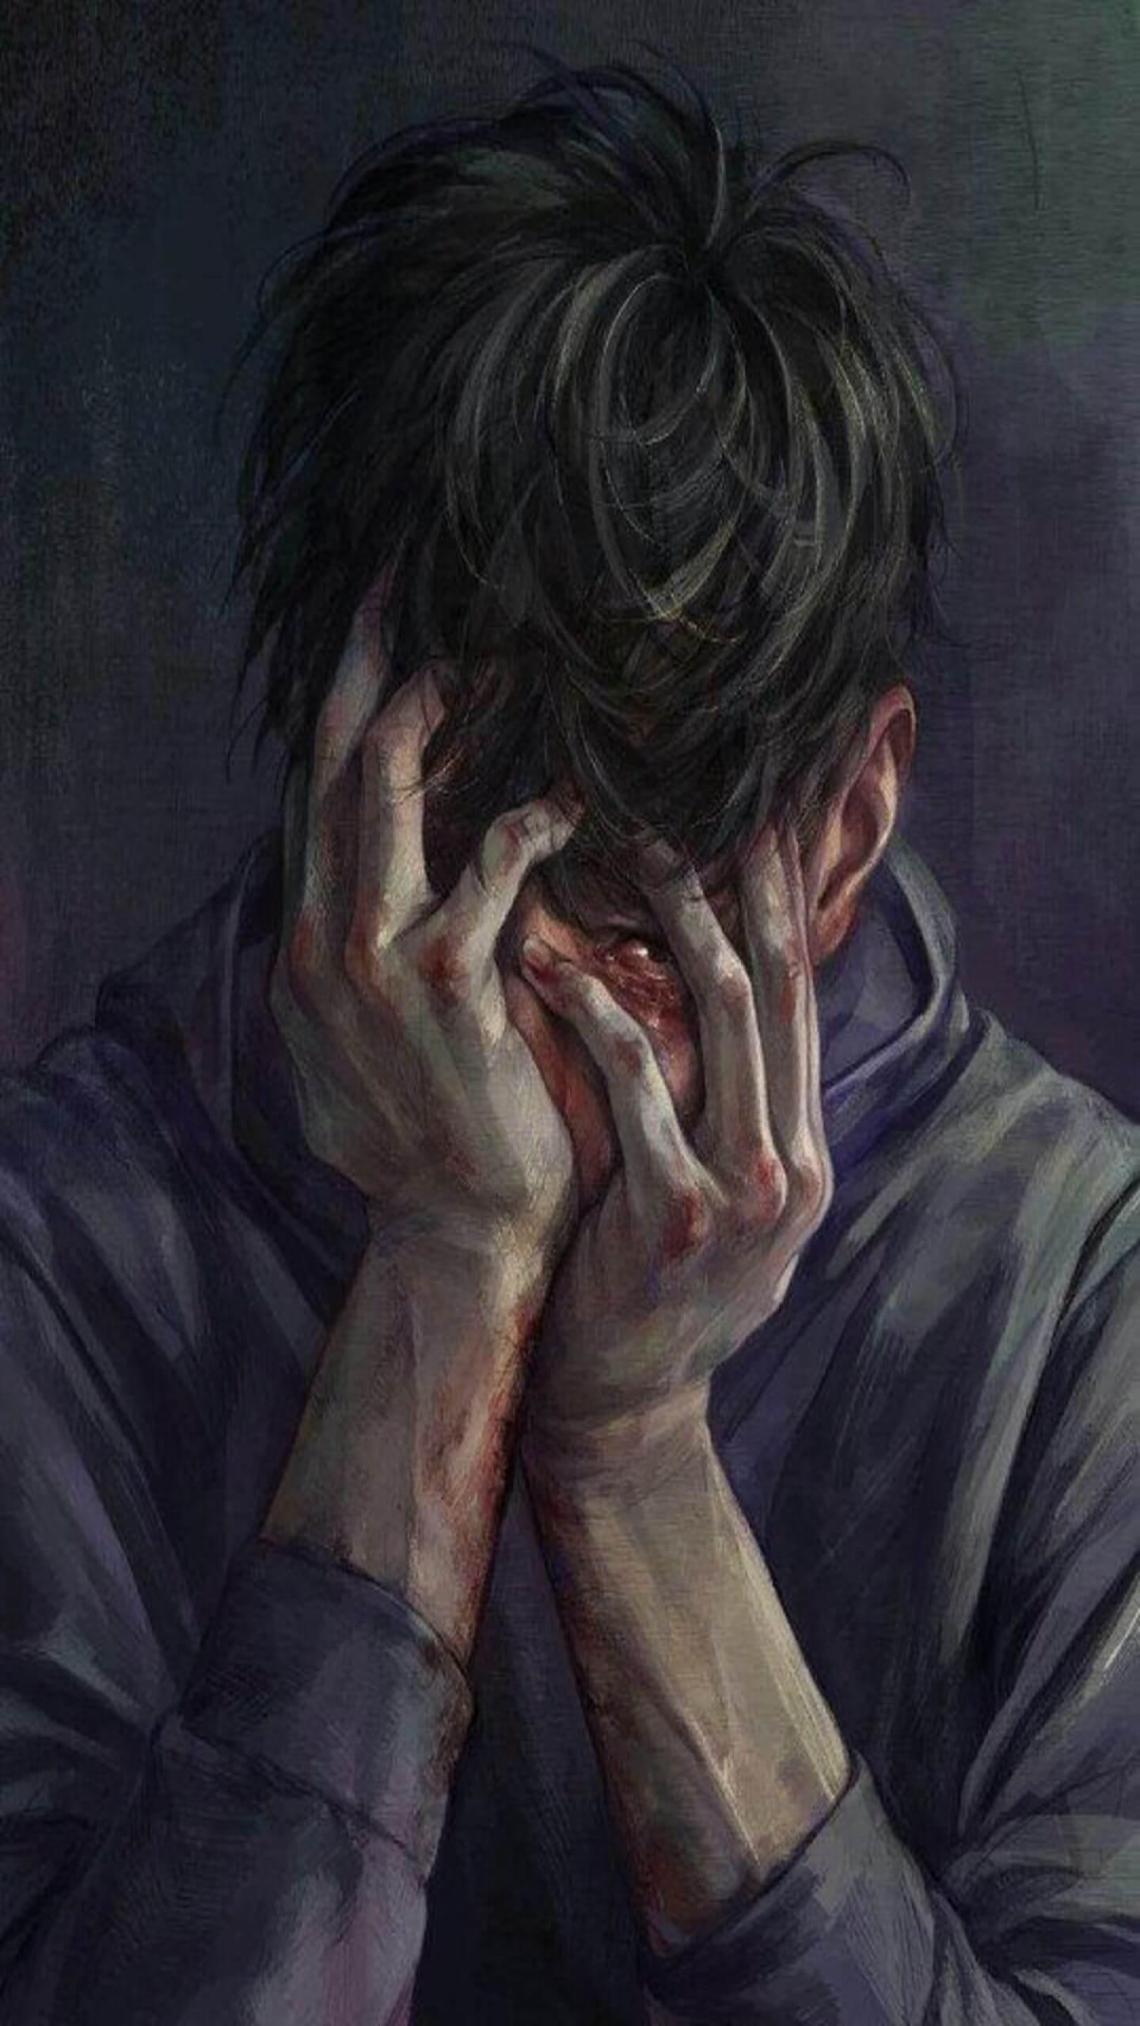 10 Sad Anime Boy Wallpaper Download